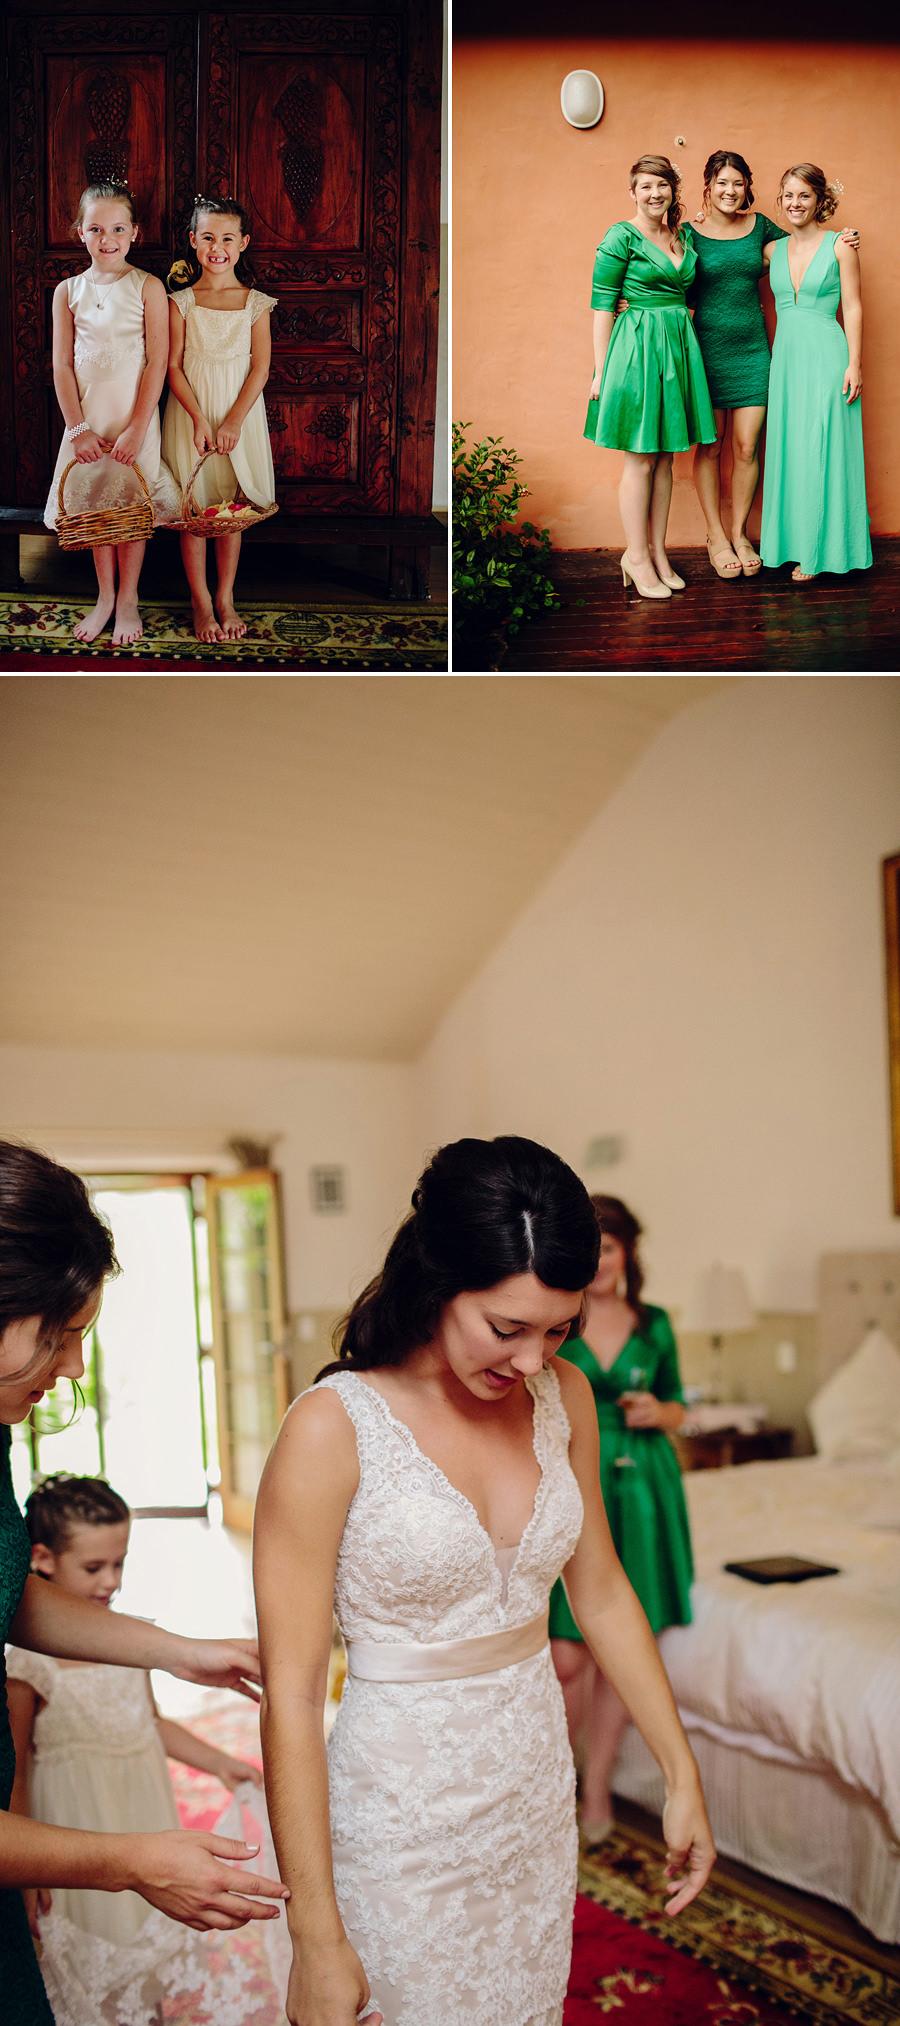 Orara Valley Wedding Photographers: Girls getting ready